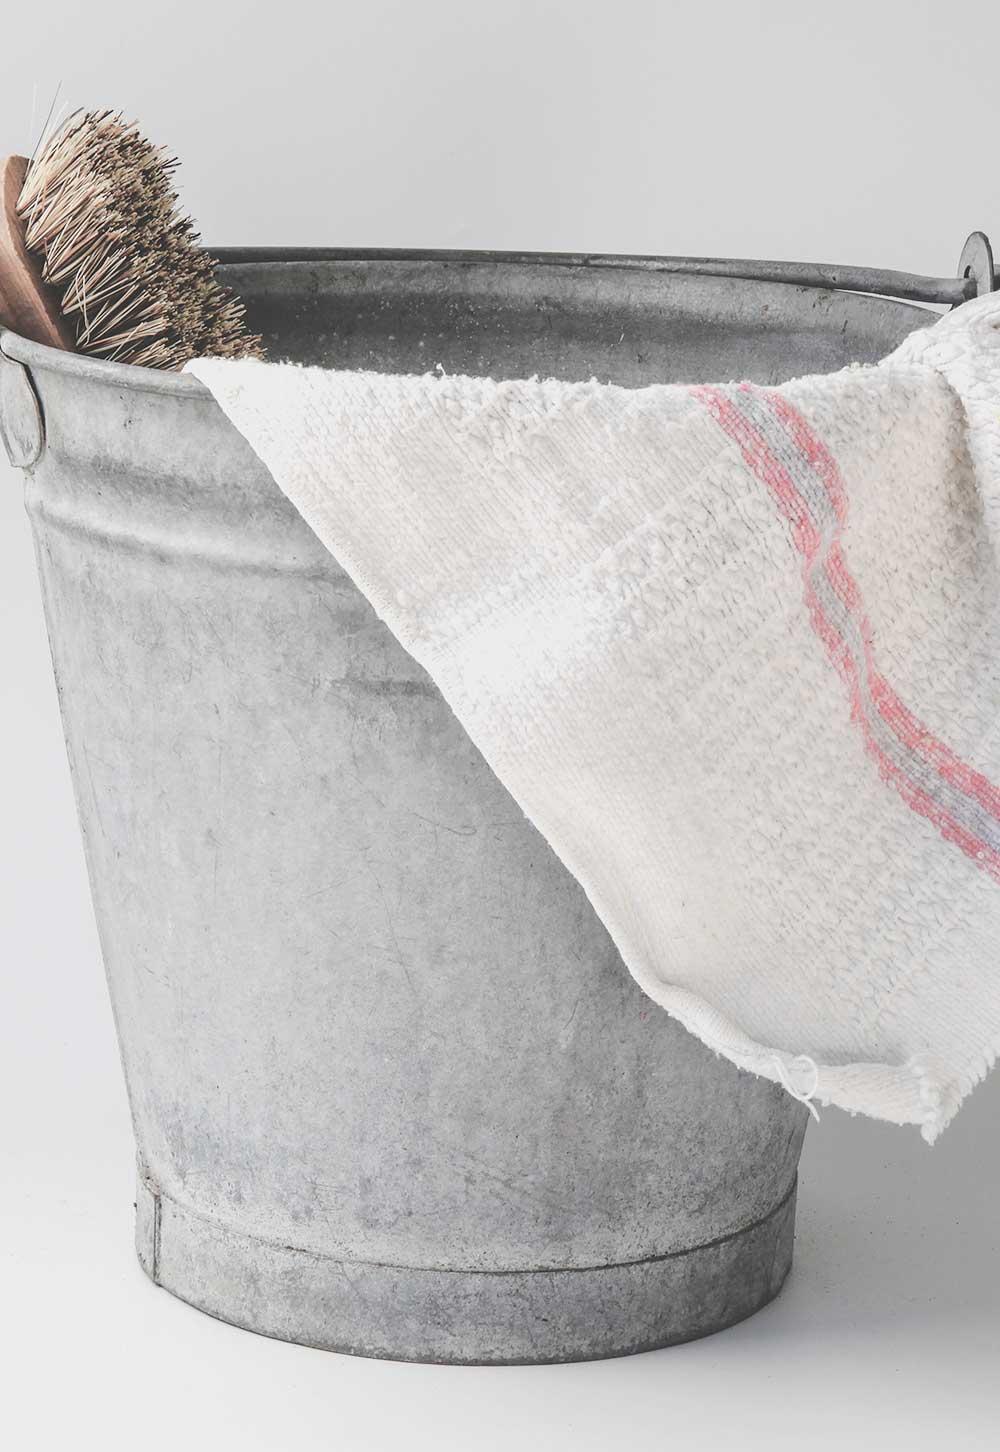 tin pail, brush and dish cloth